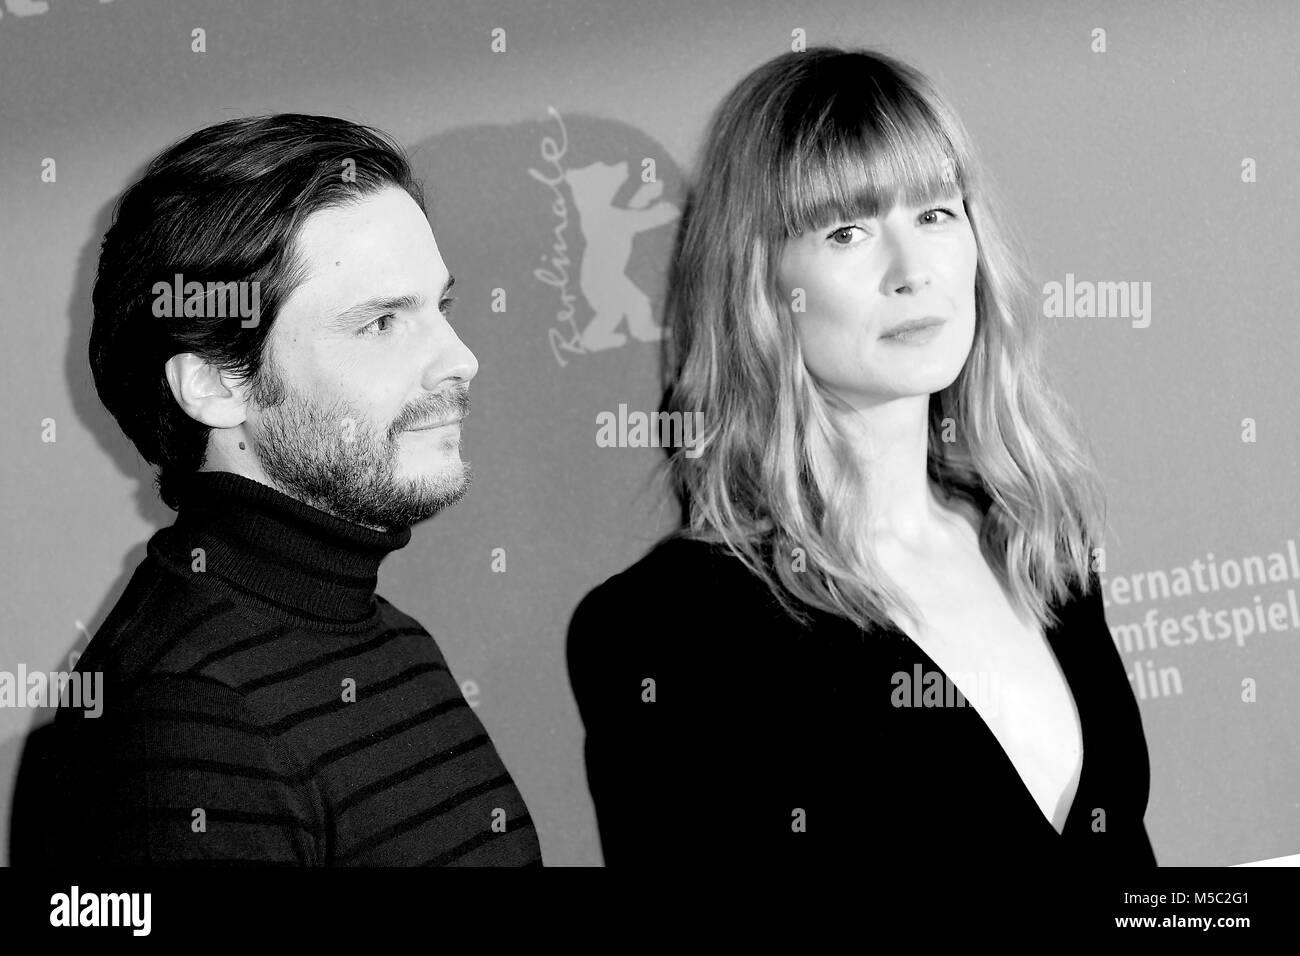 Daniel Bruhl & Rosamund Pike attend the 68th Berlinale International Film Festival Berlin photocall of 7 Days - Stock Image